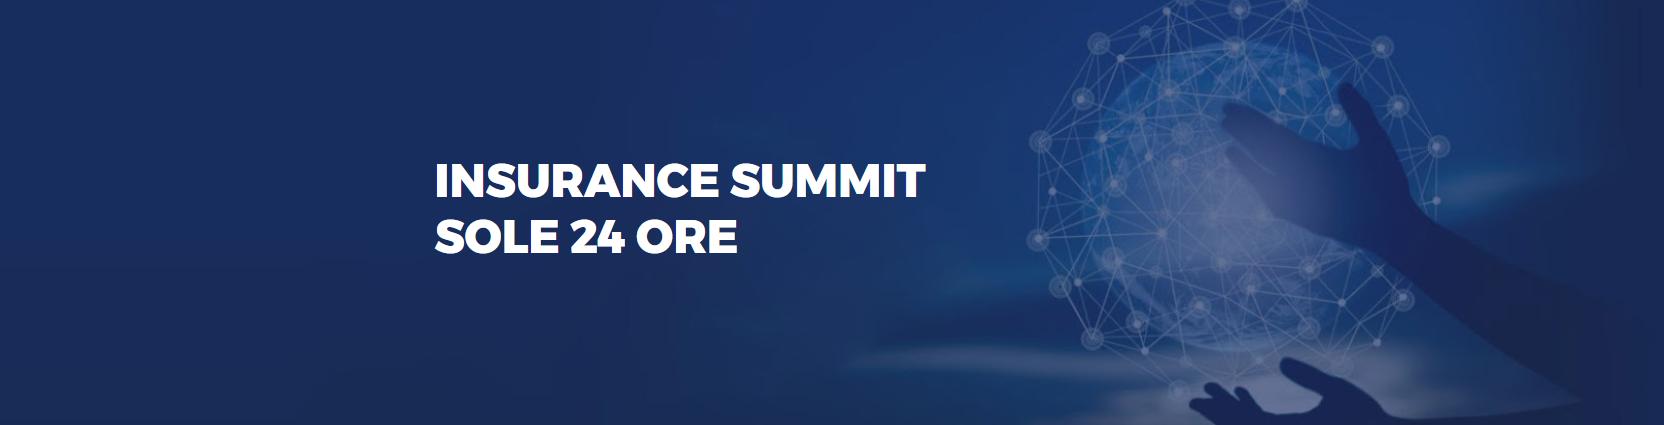 <p>Insurance Summit Sole 24 Ore</p>